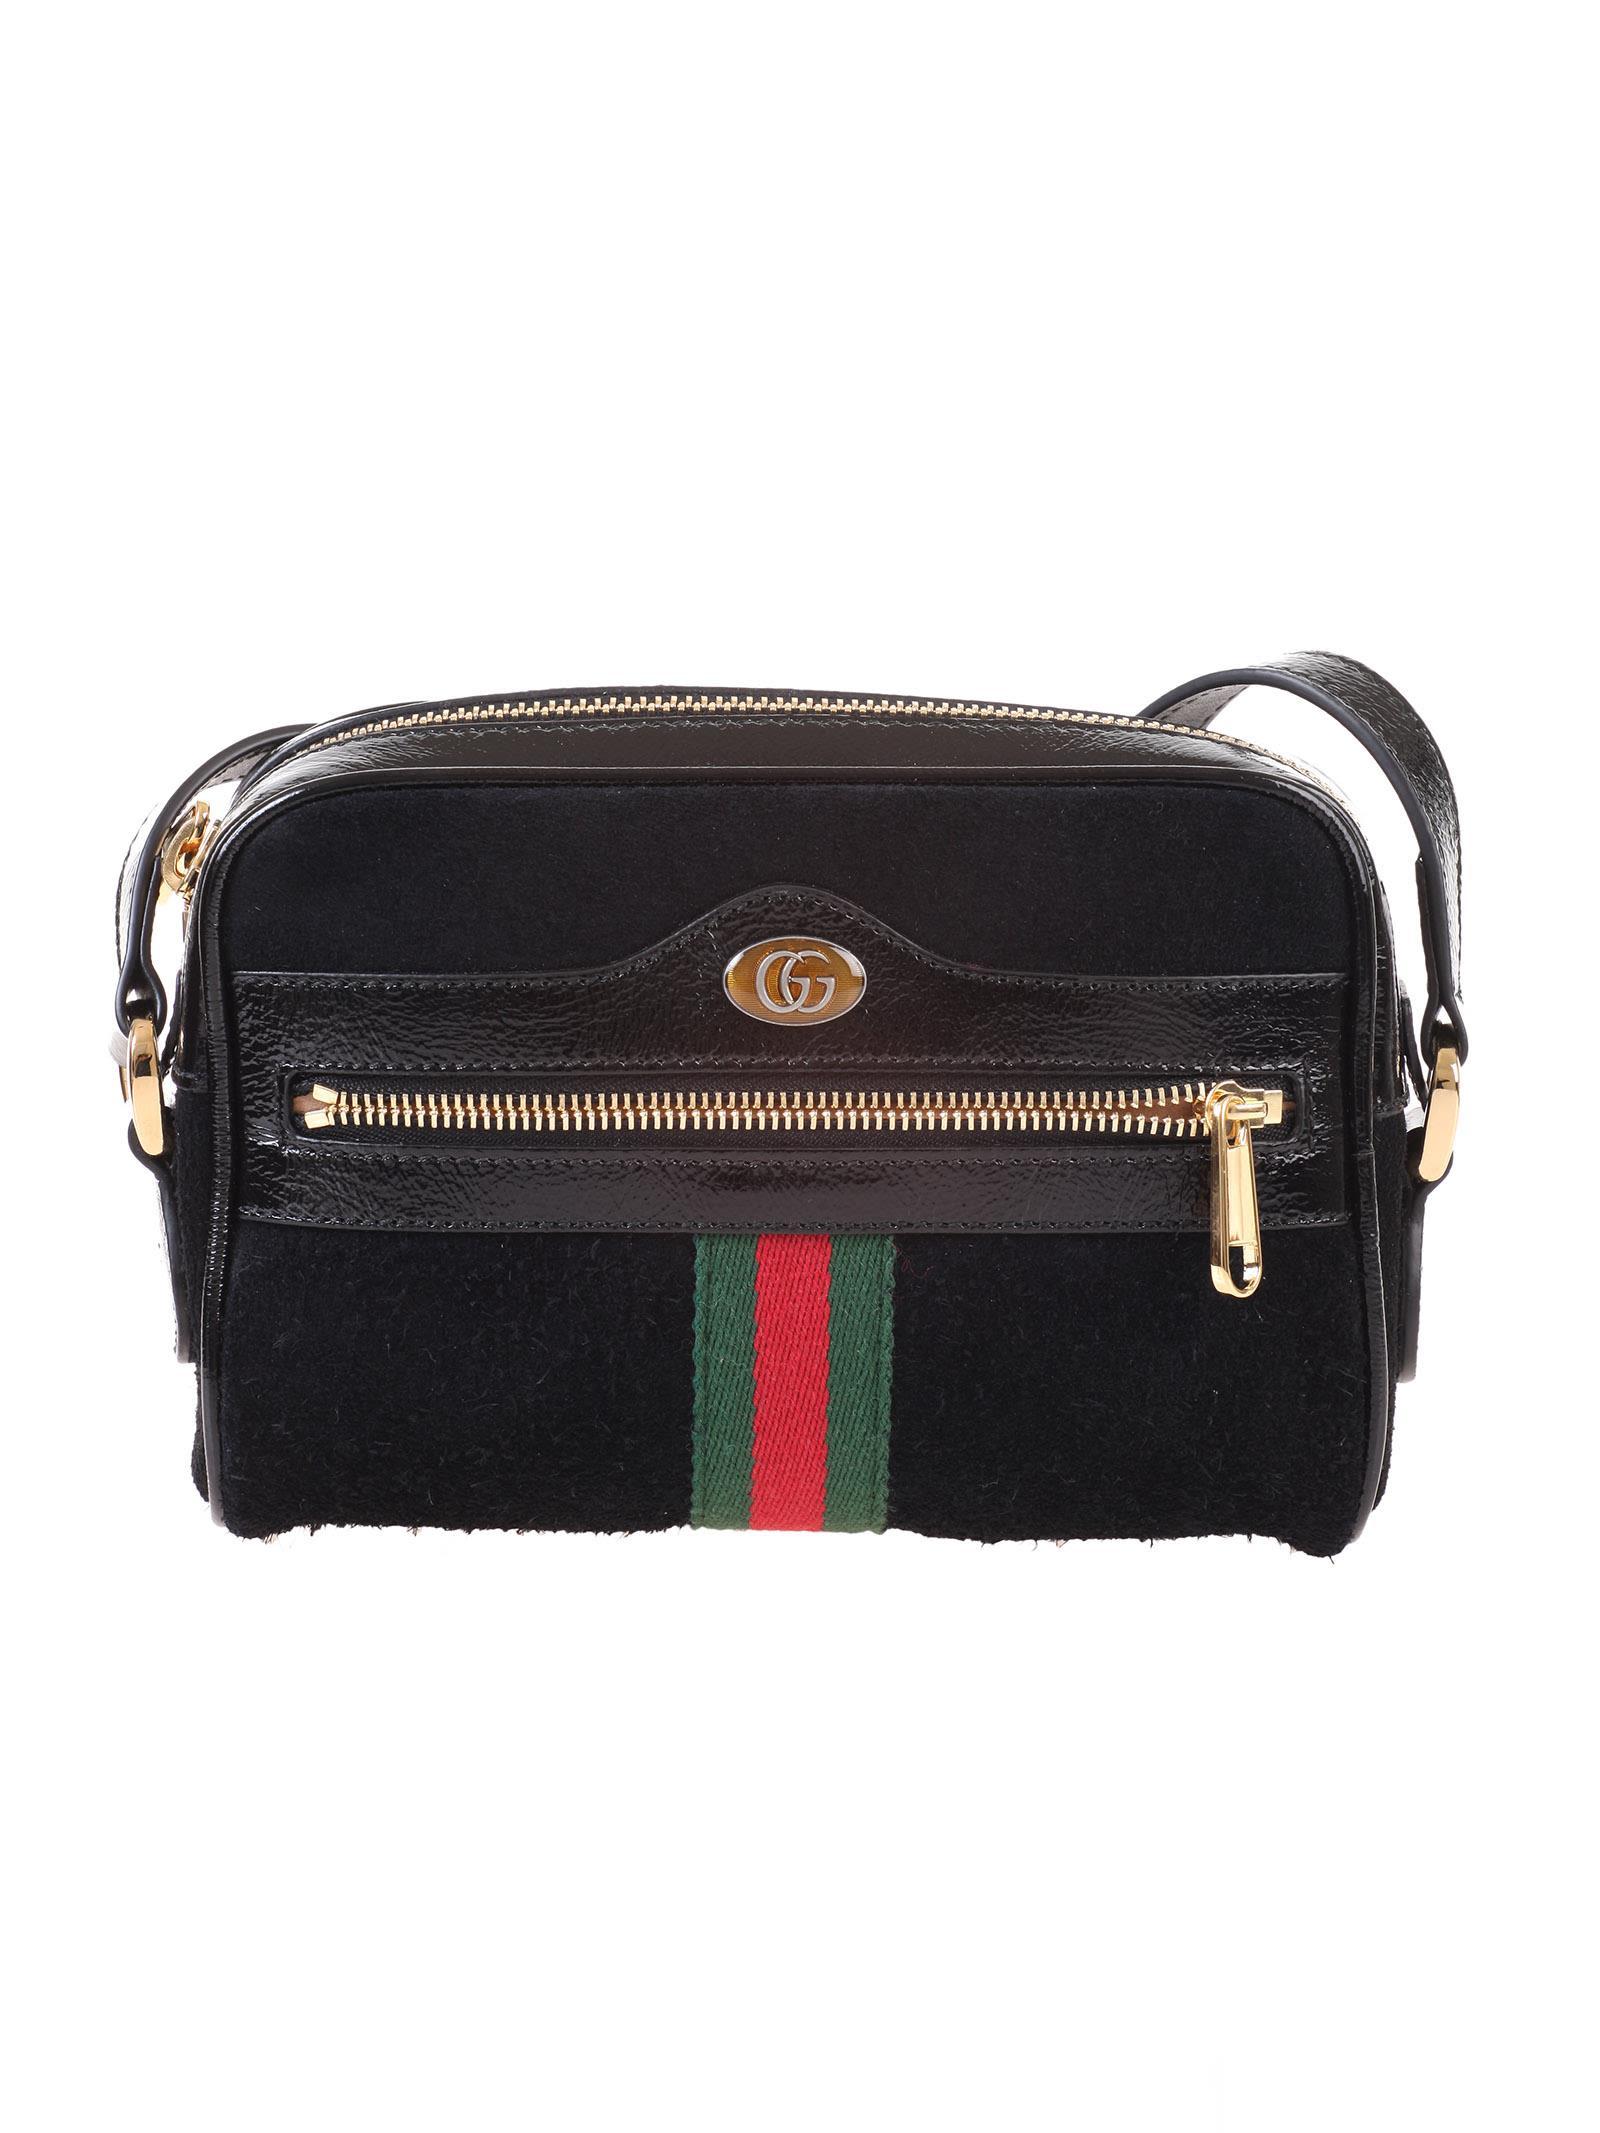 Gucci Shoulder Gucci Black suede Ophidia mini bag